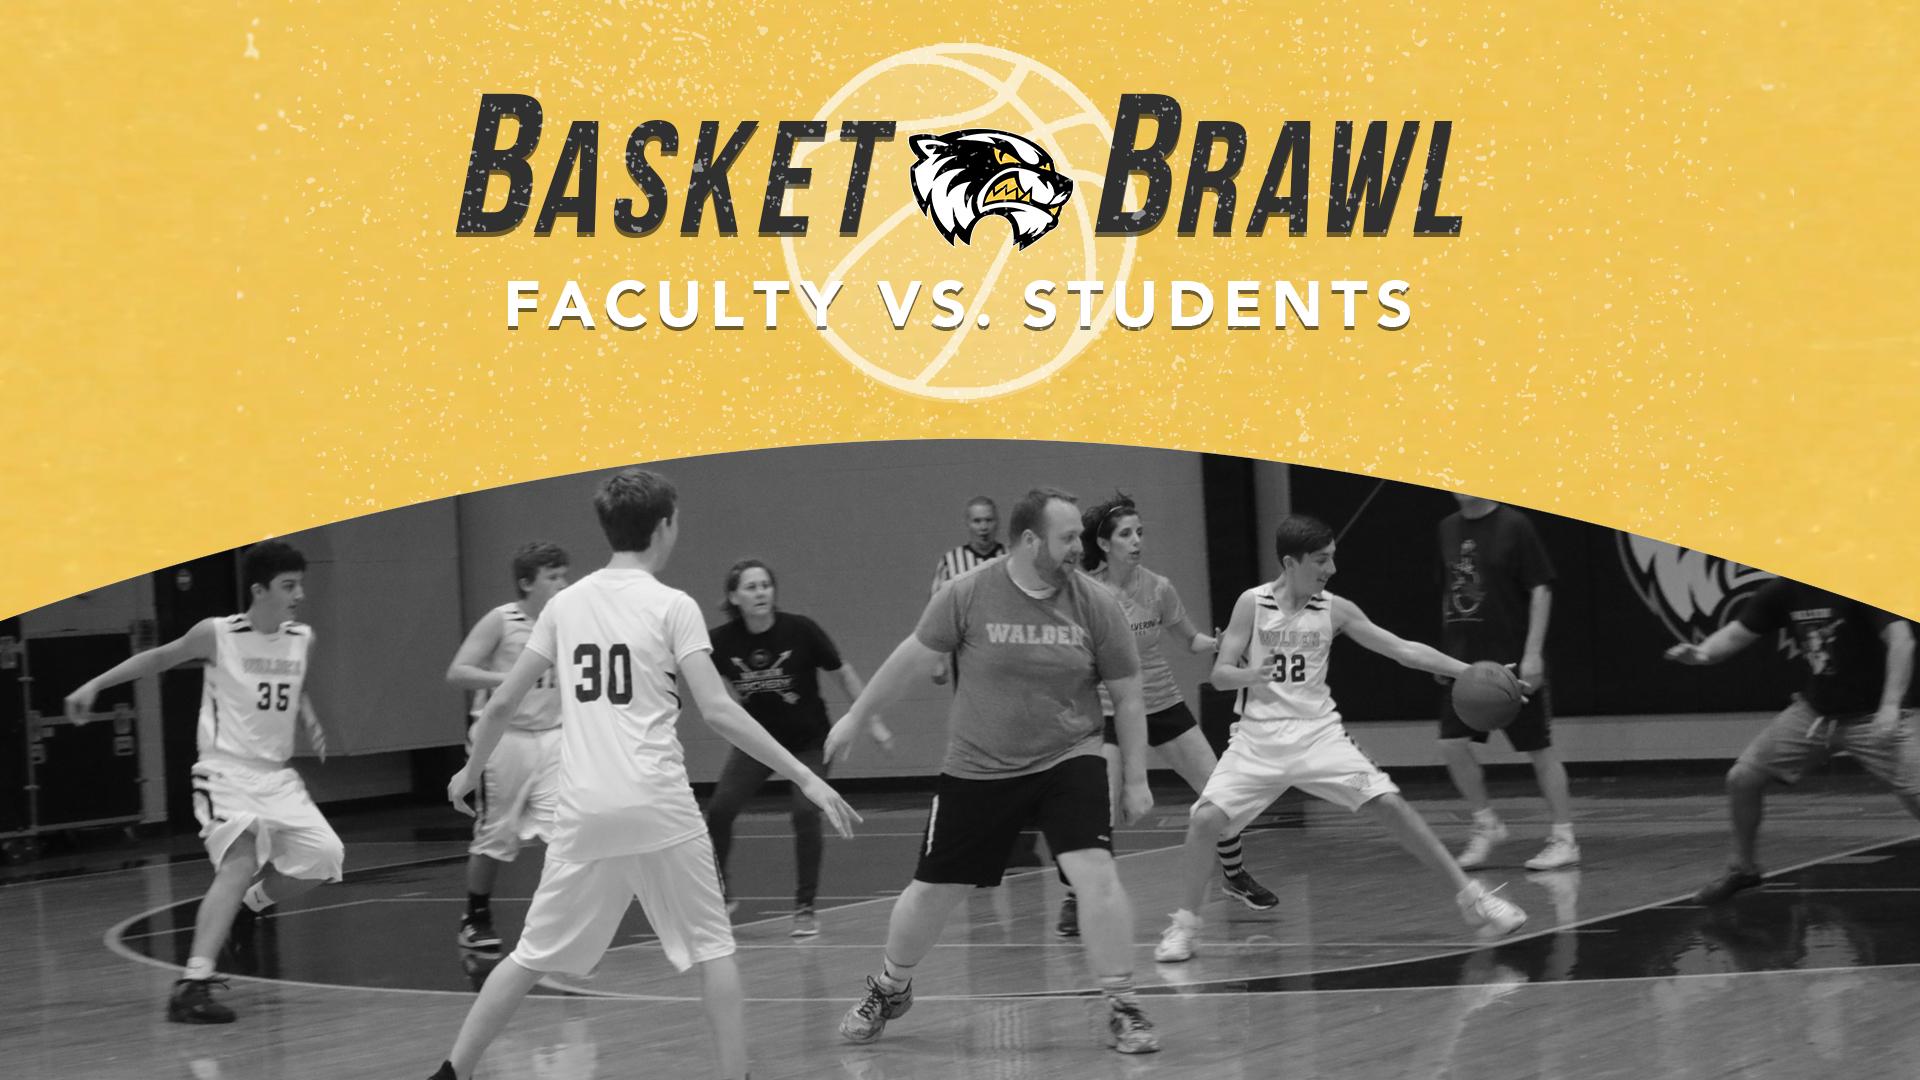 Basketbrawl_event image.jpg